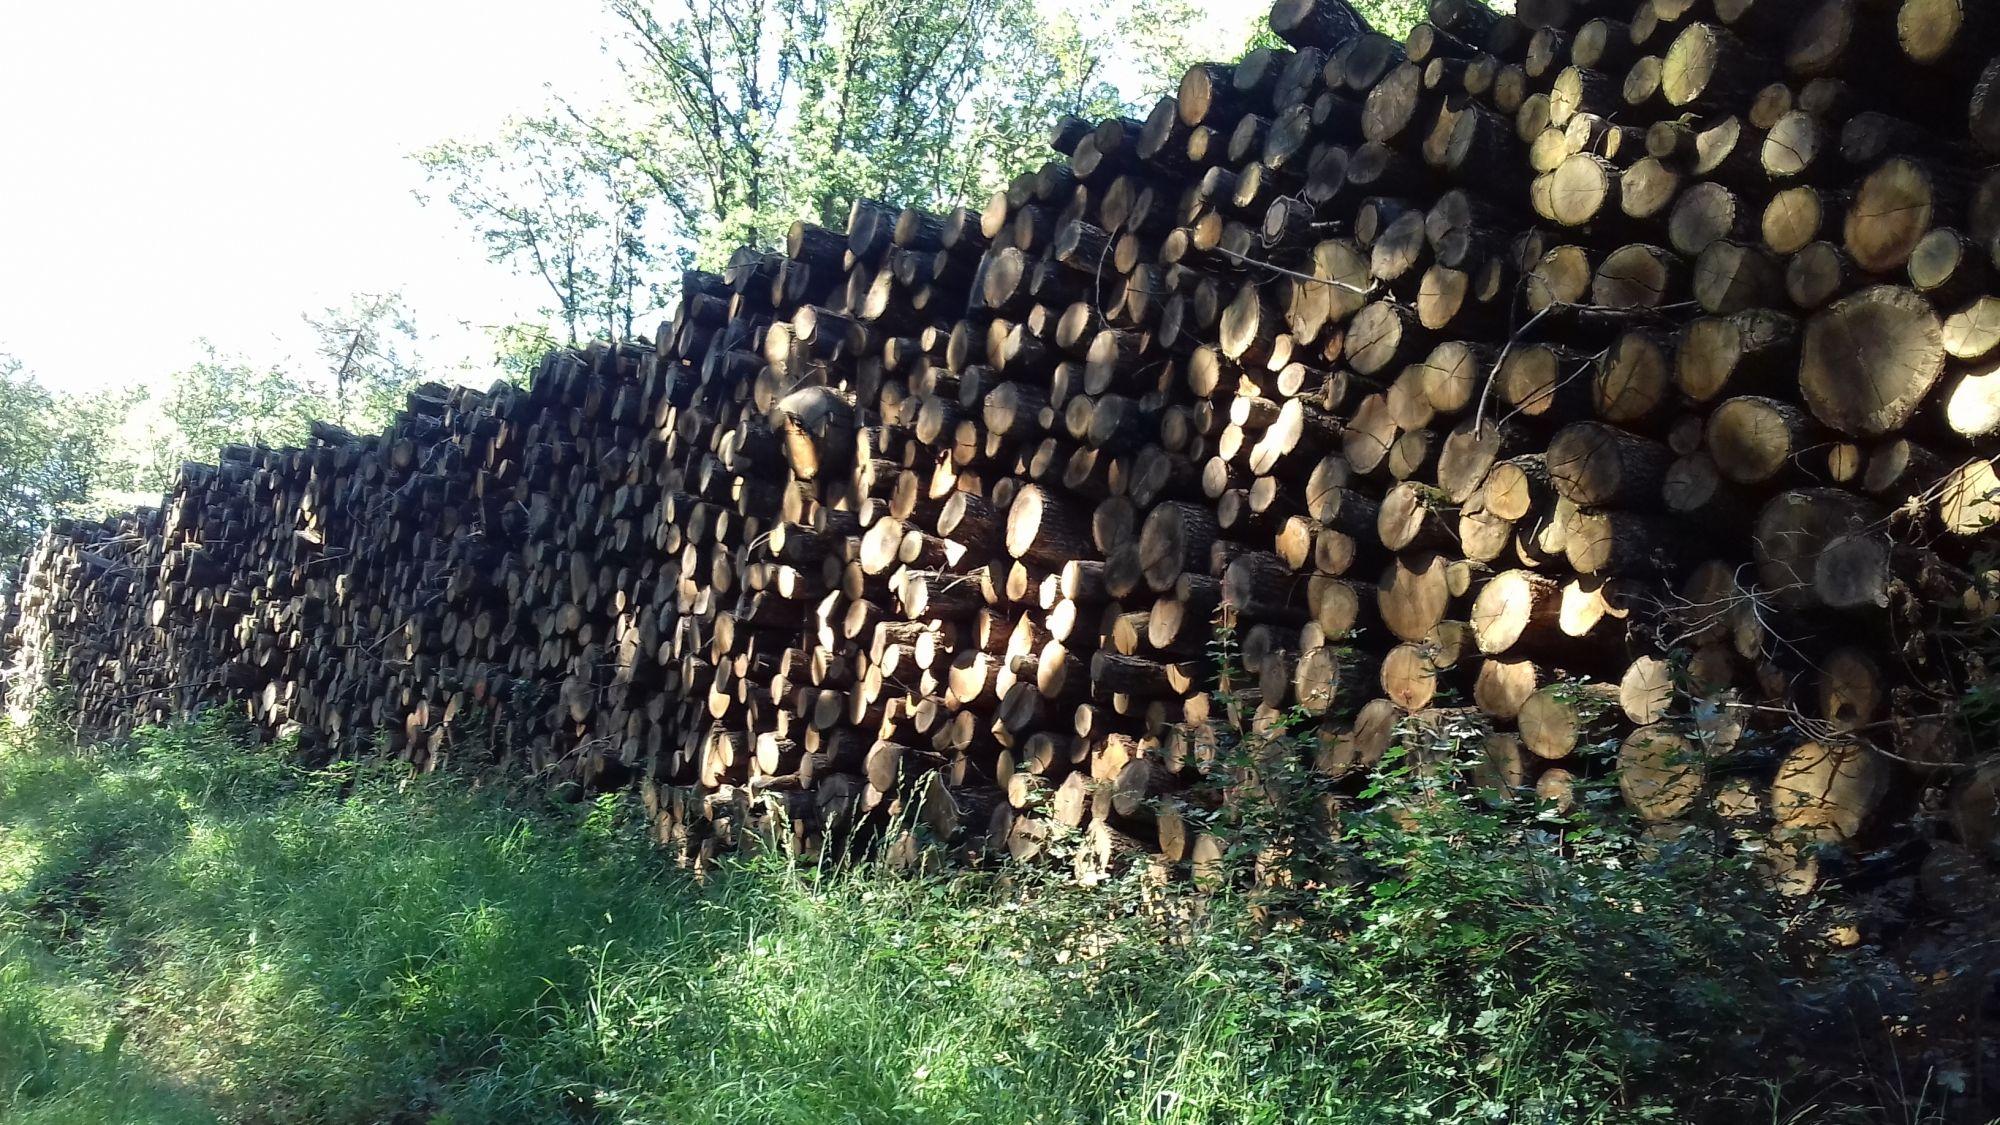 bois de chauffage 16bois de chauffage Charente